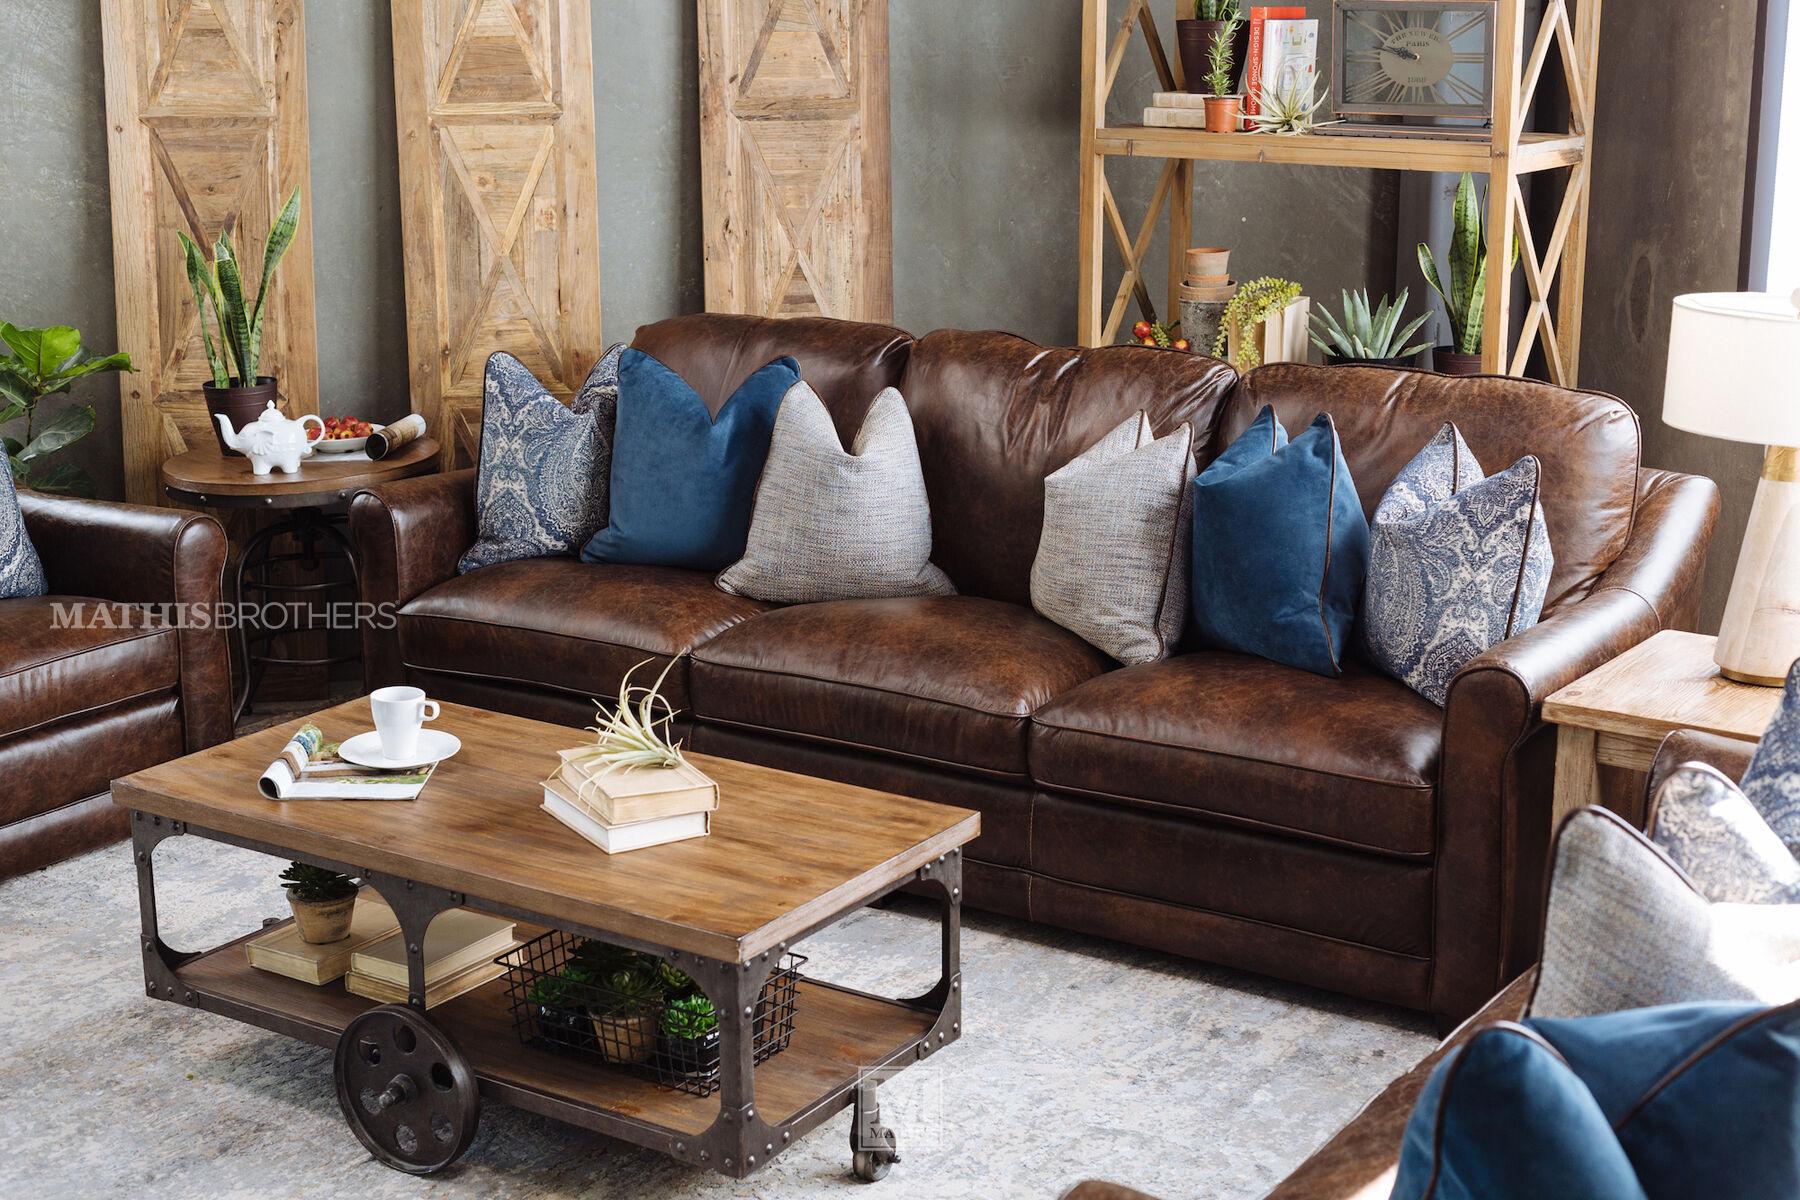 Open-Shelf Rustic Farmhouse Coffee Table In Dark Brown